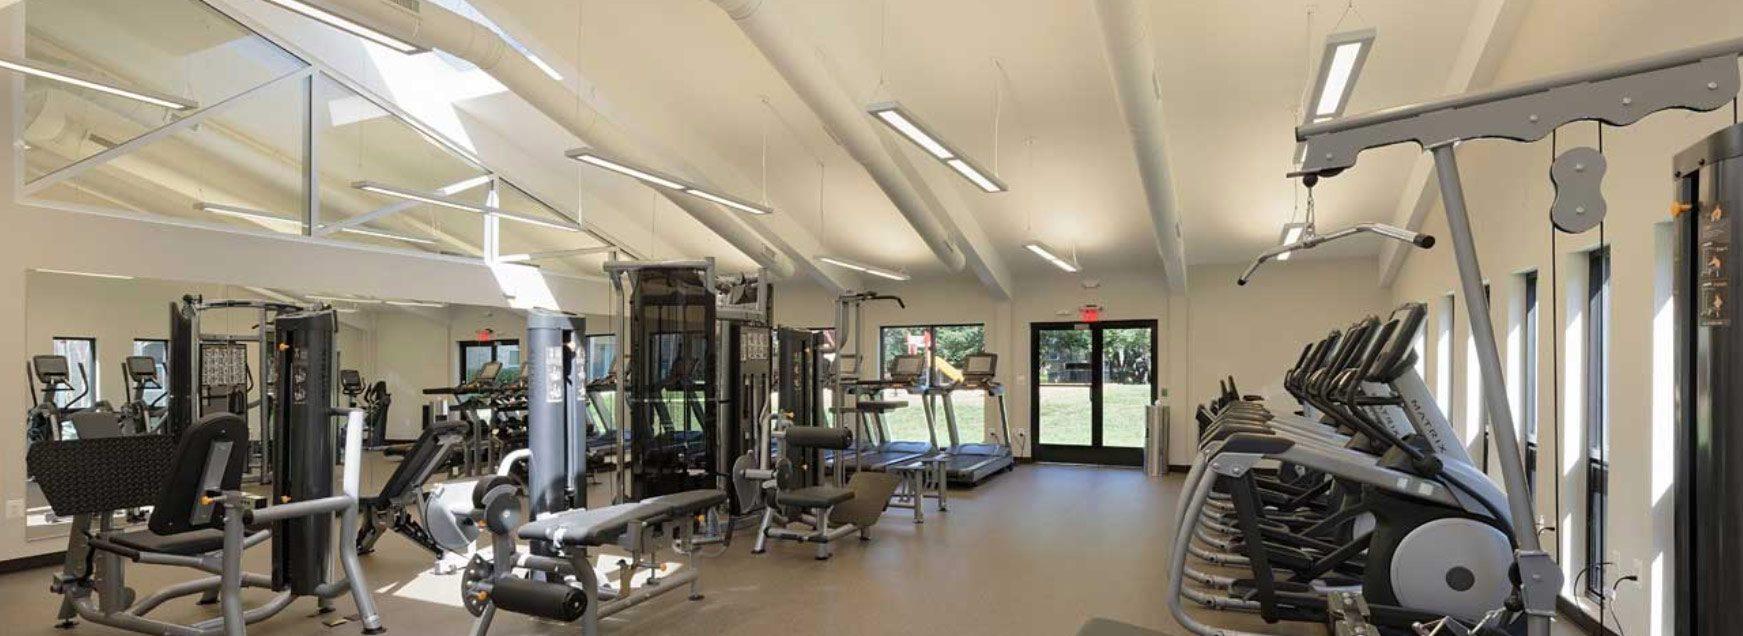 Brighton Village fitness center